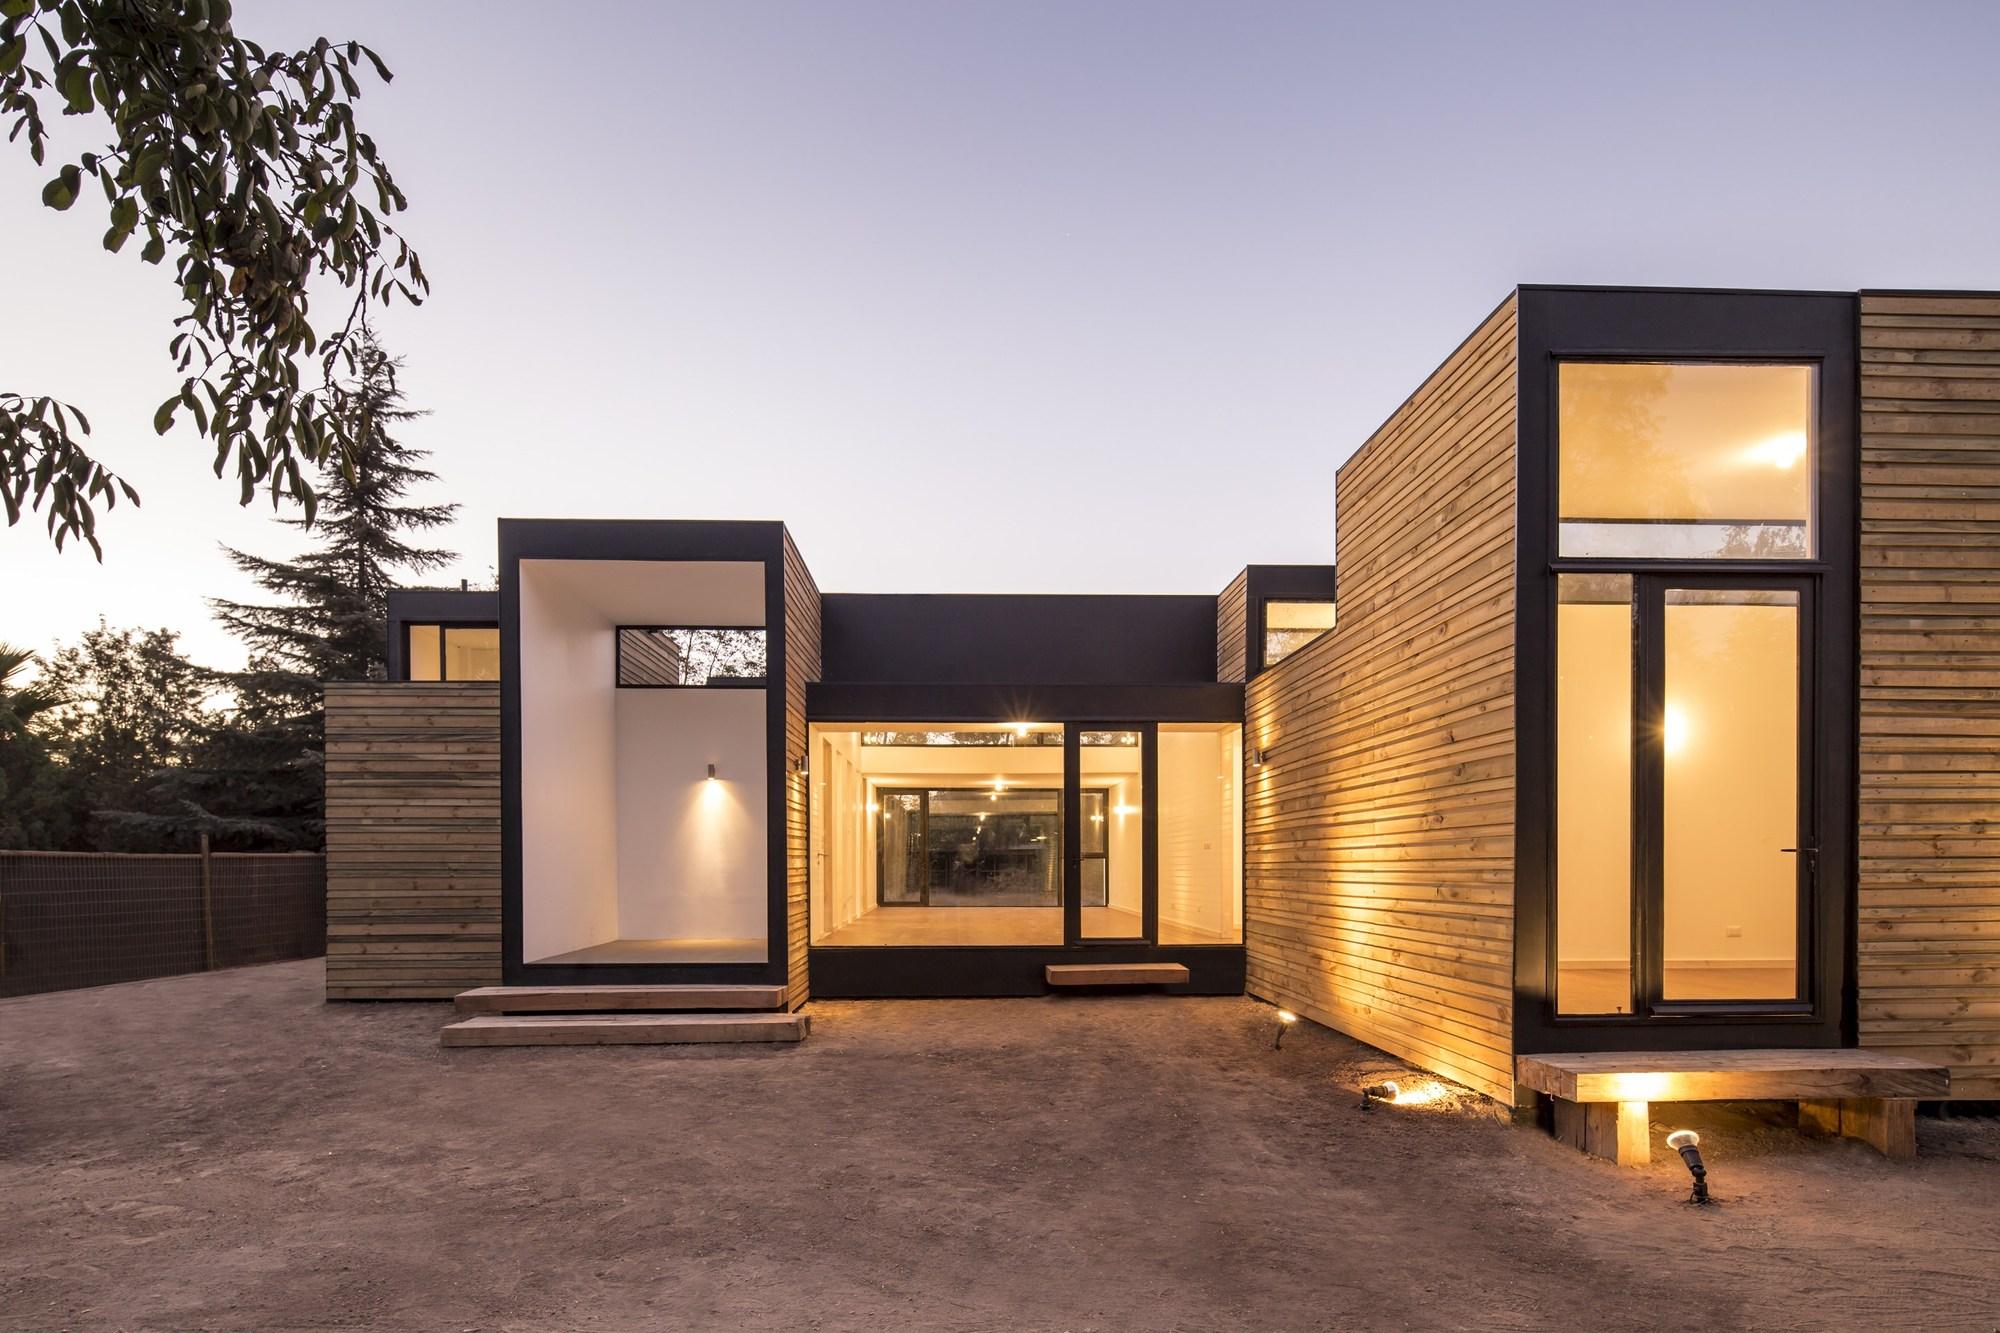 Casa sip m3 ian hs gabriel rudolphy plataforma for Sip panel home plans